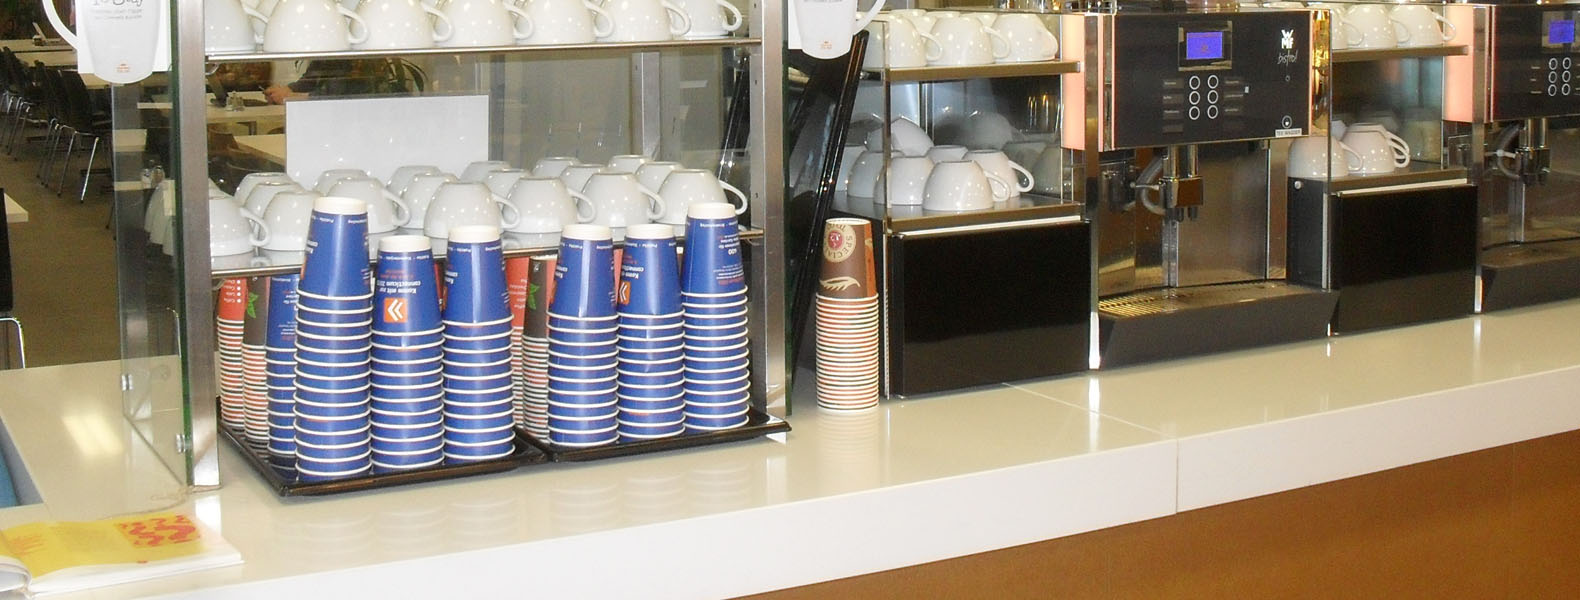 campus cups ihr mobiler werbetr ger mit hoher. Black Bedroom Furniture Sets. Home Design Ideas